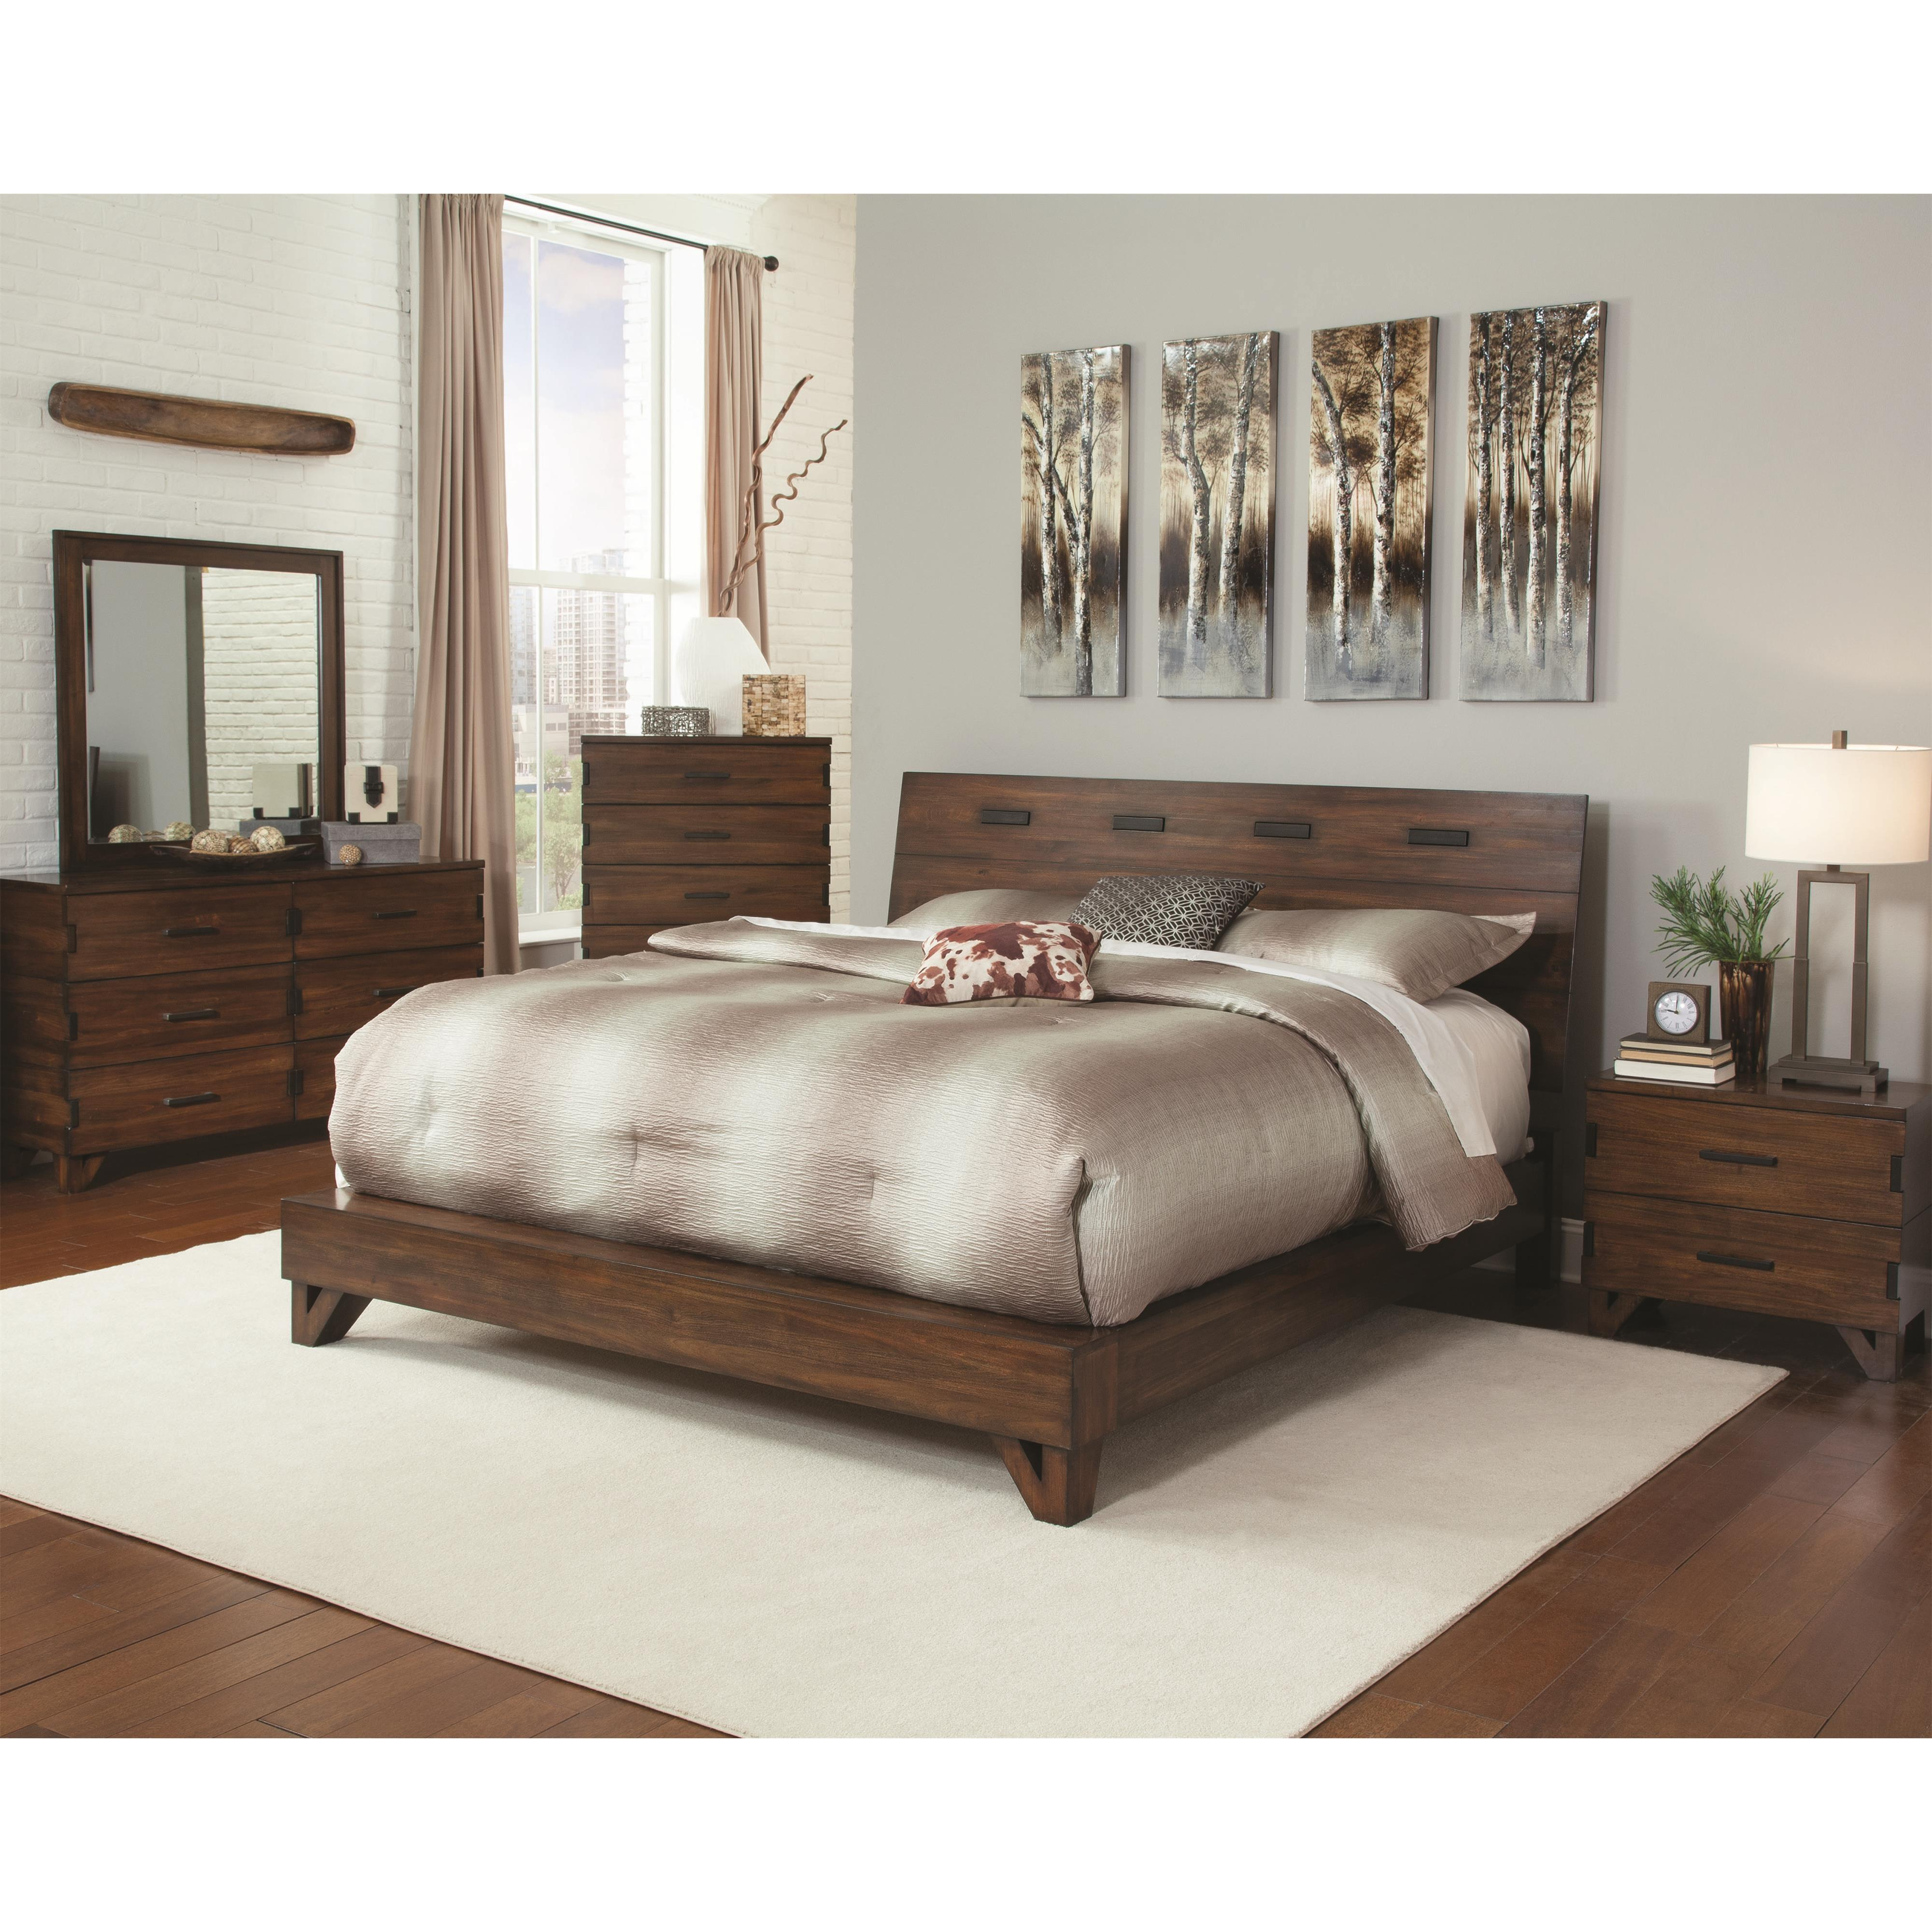 Bedroom Sets – All American Mattress & Furniture